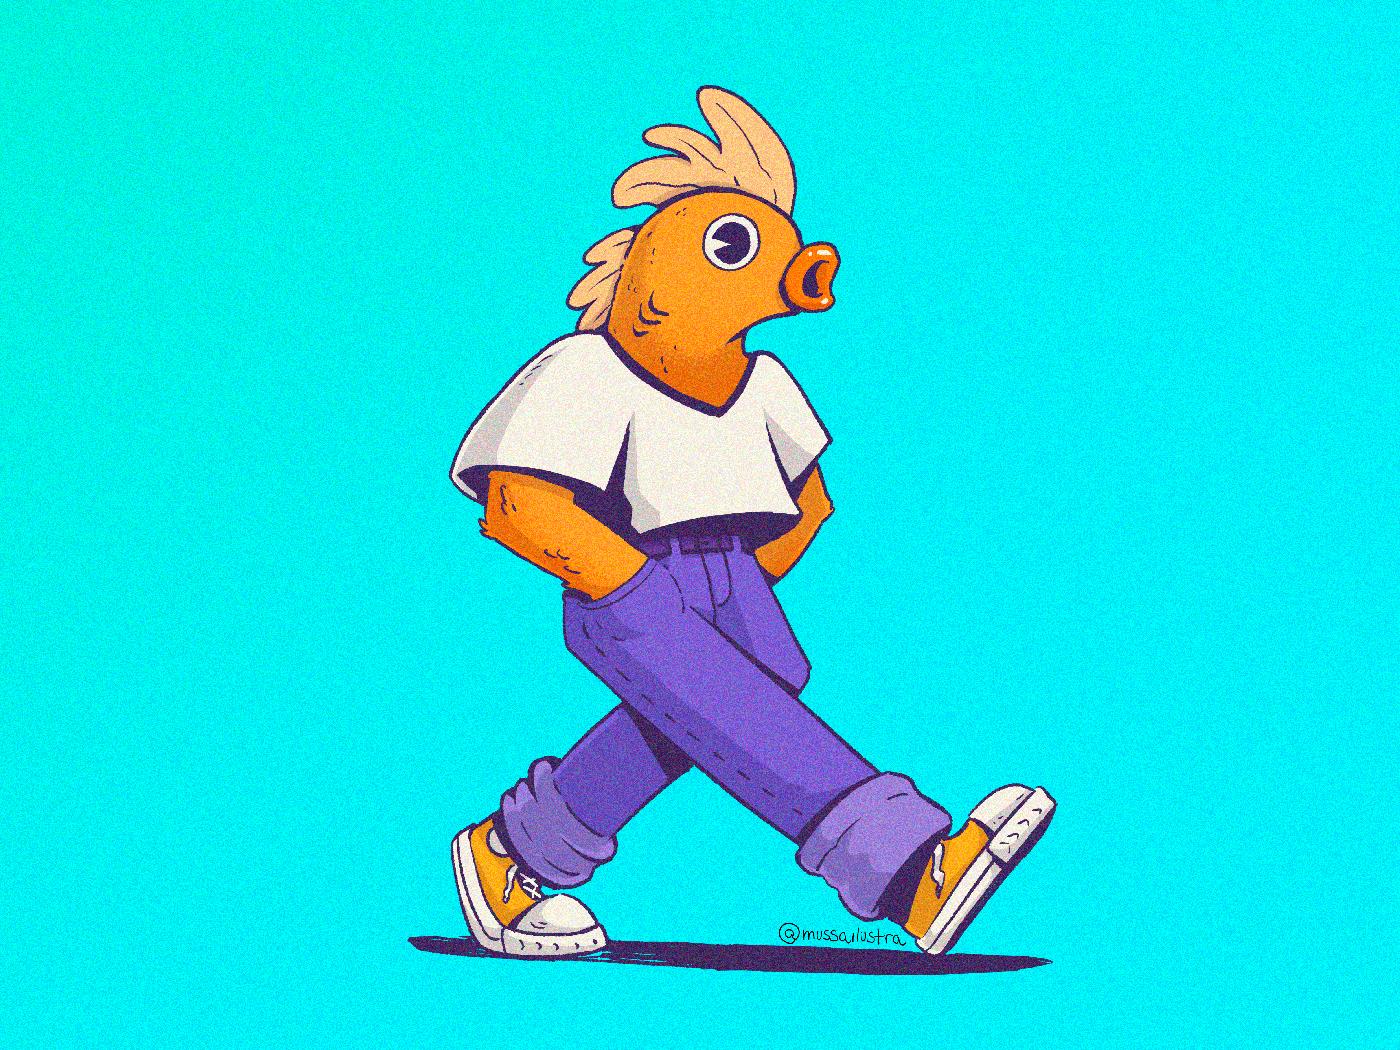 Human nº1 cartoon fish illustration